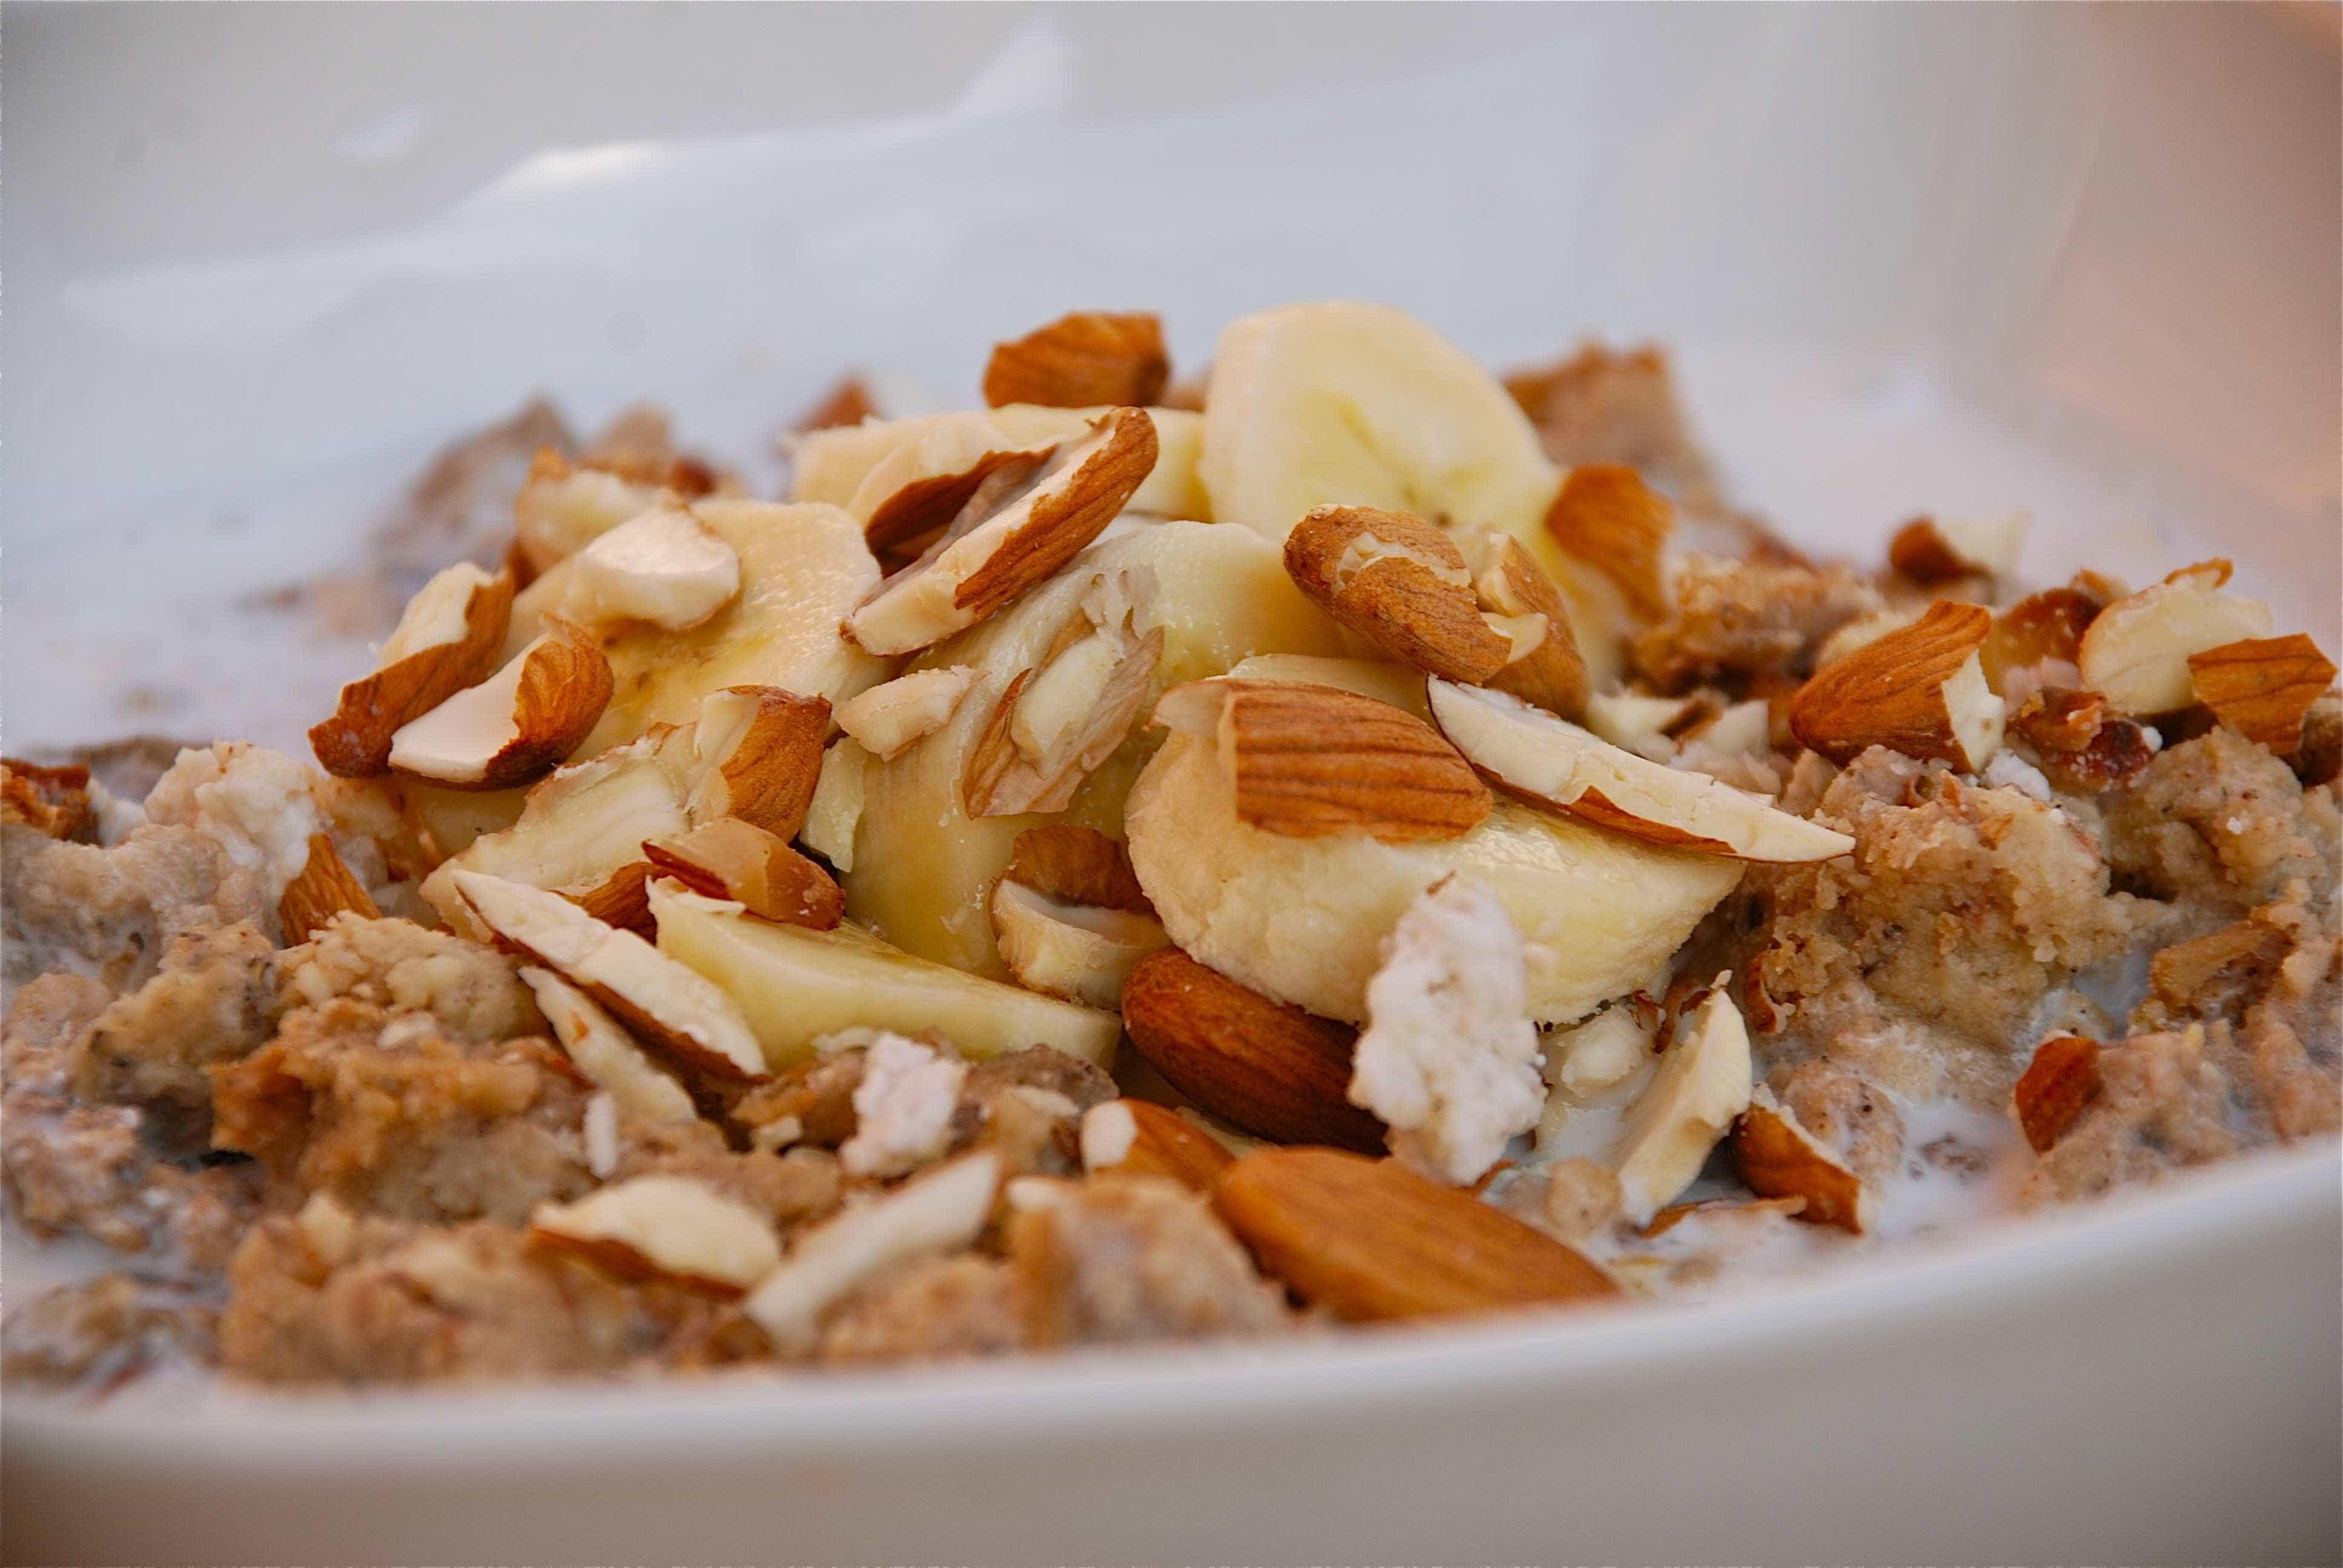 Banana Bread Porridge